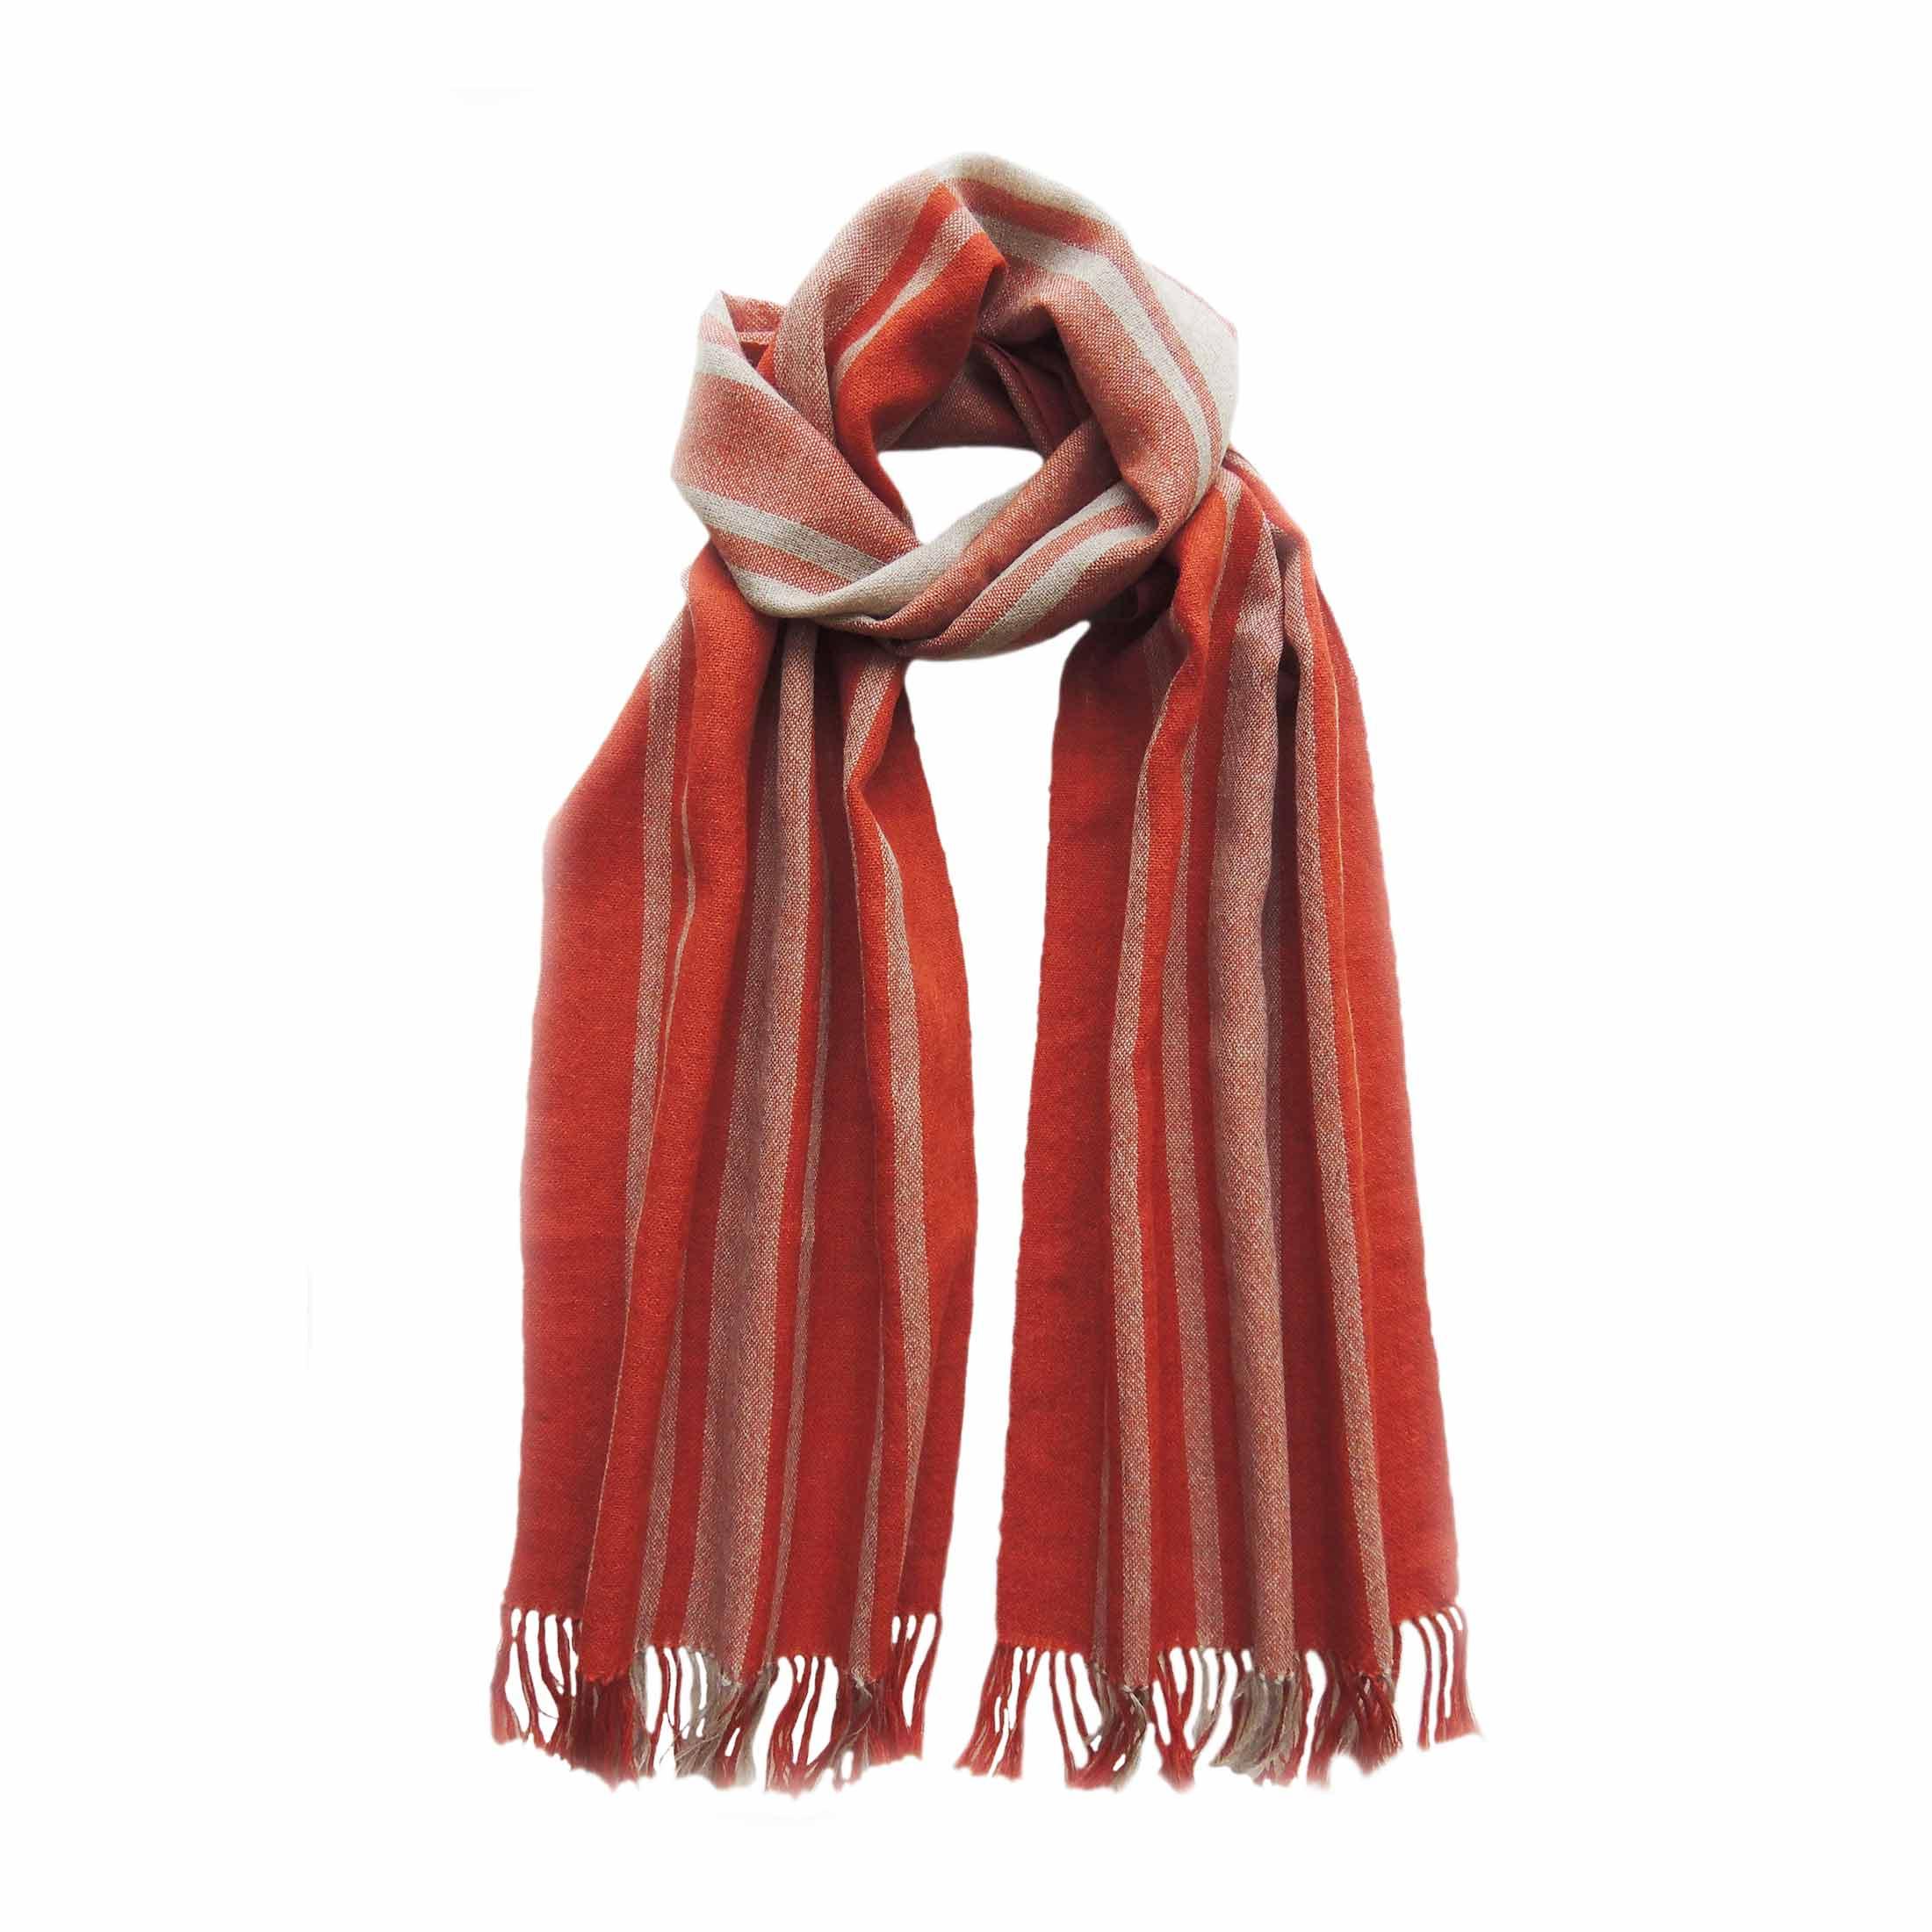 PopsFL knitwear Peru wholesale manufactorhandwoven scarf baby alpaca striped two colors